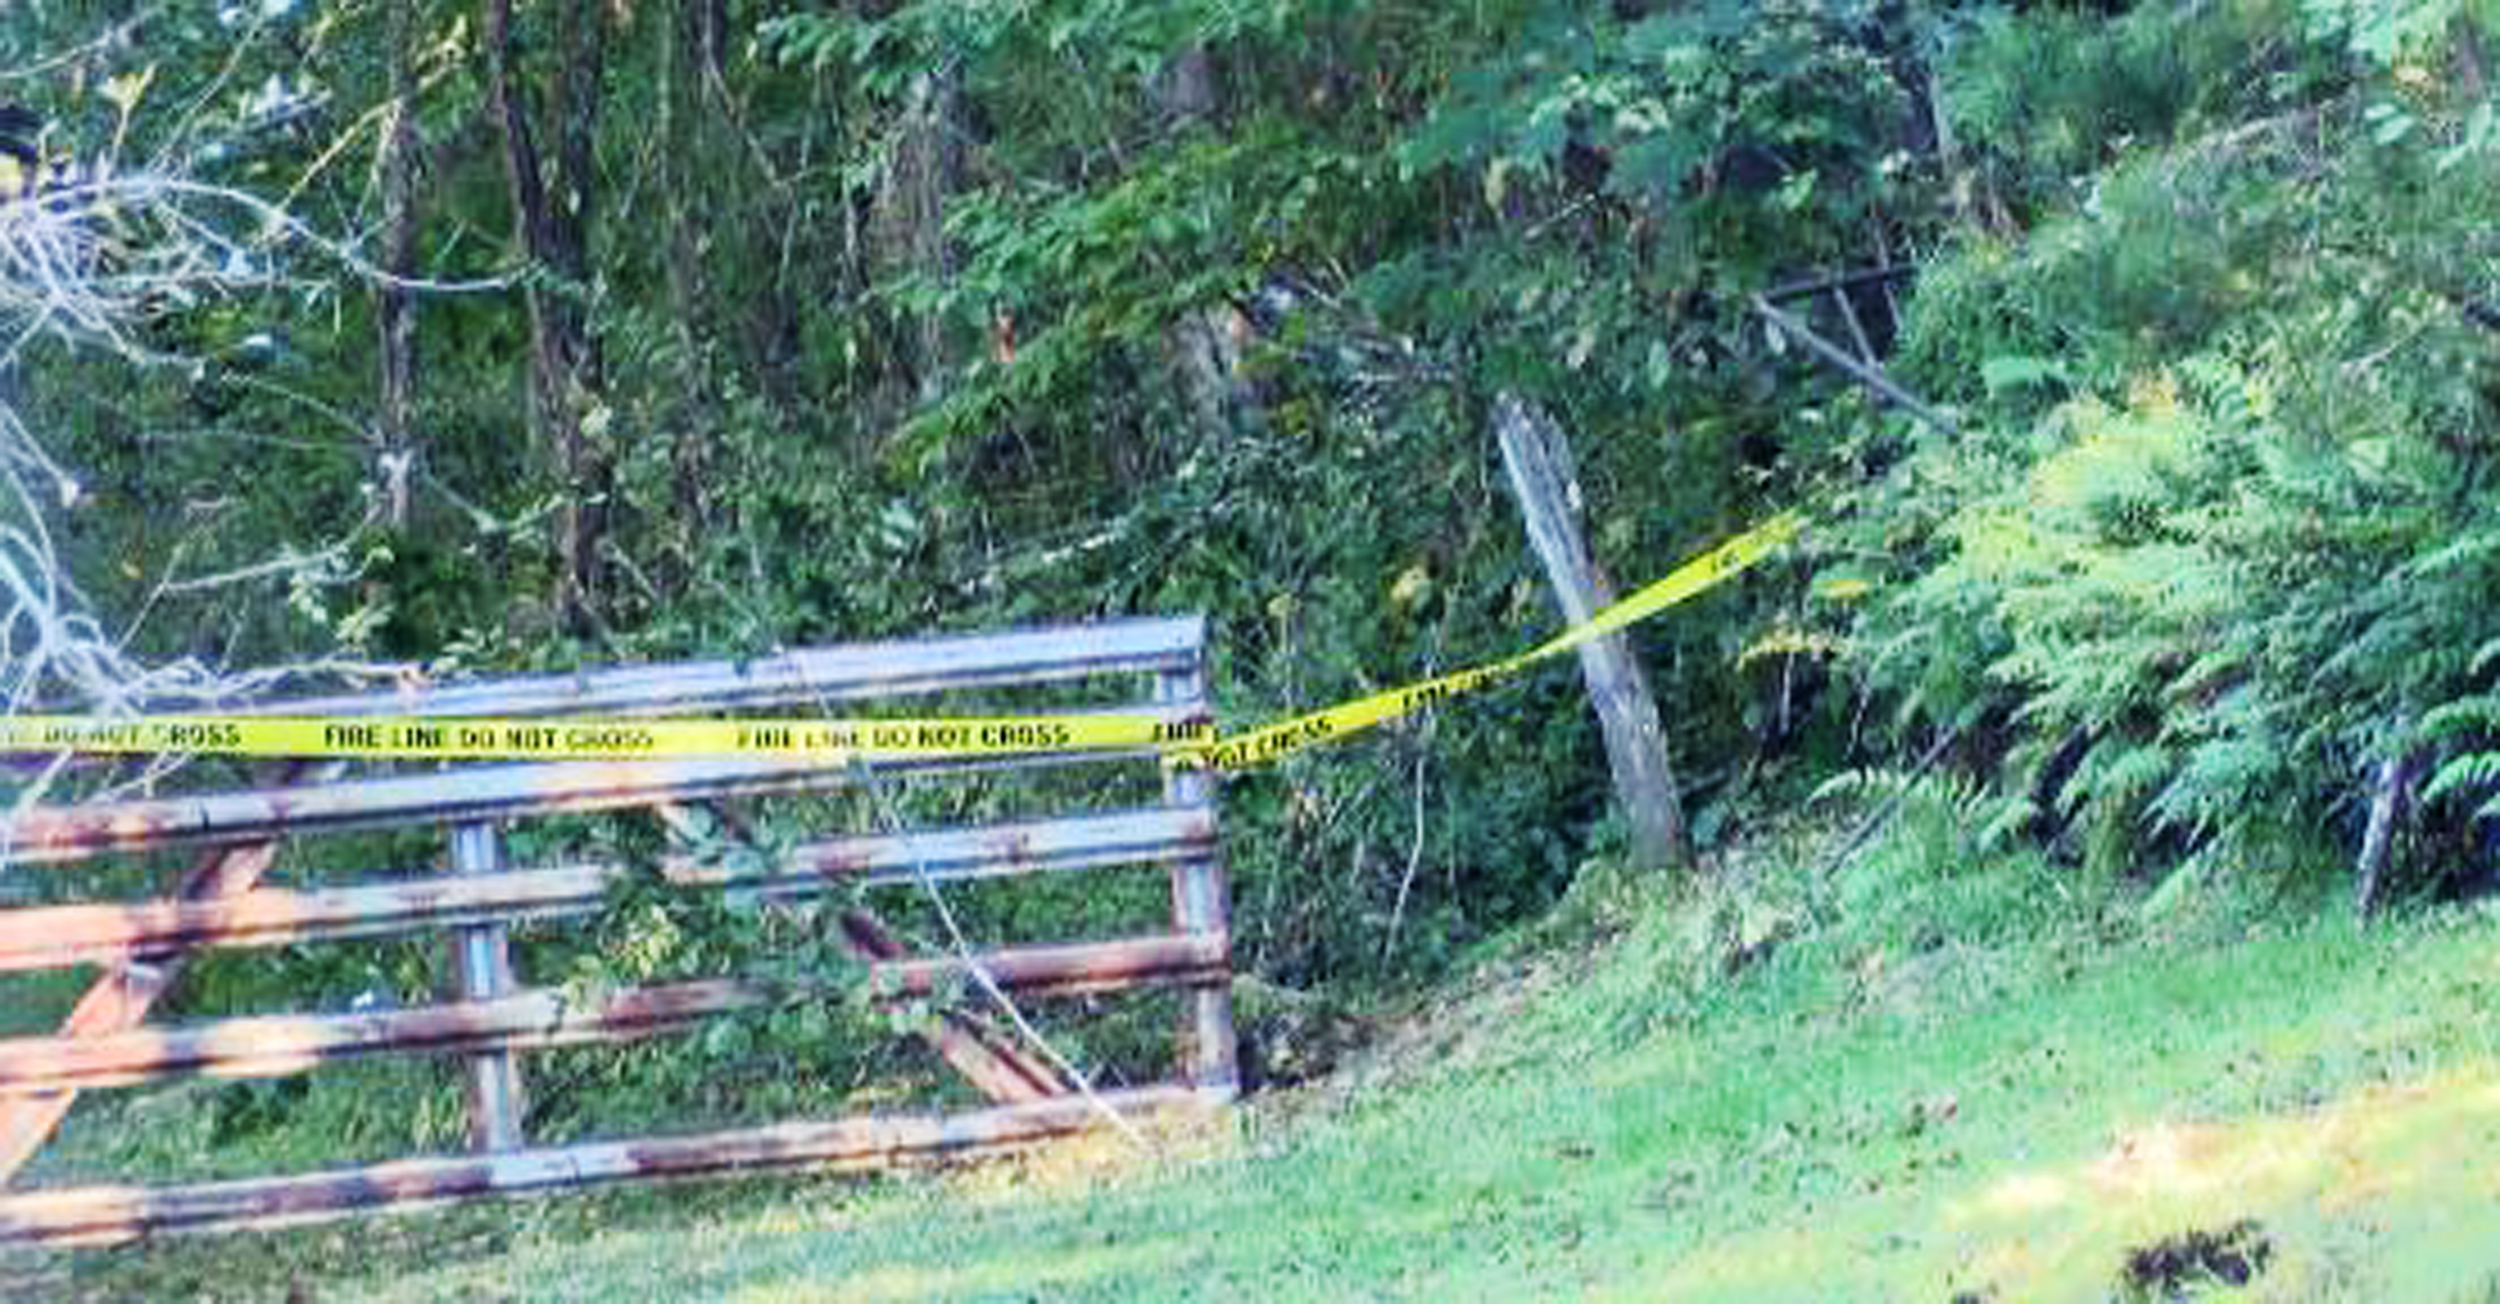 3 killed in West Virginia plane crash